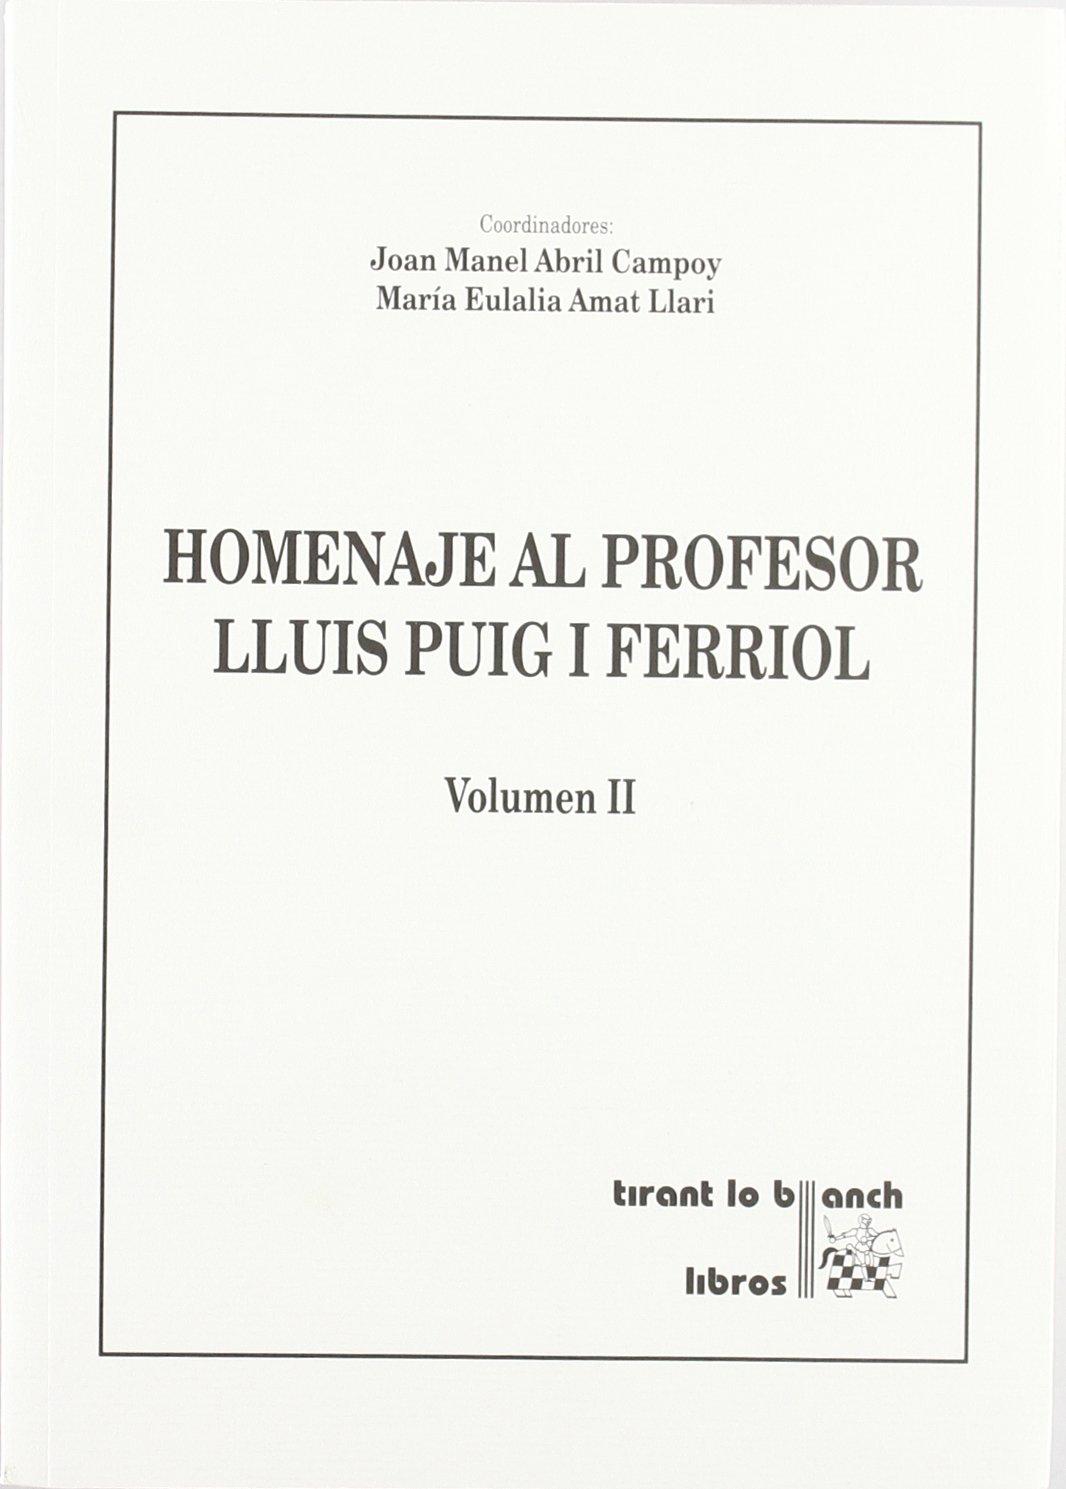 Homenaje al Profesor LLuis Puig i Ferriol: Amazon.es: Juan Manuel Abril Campoy, María Eulalia Amat Llari: Libros